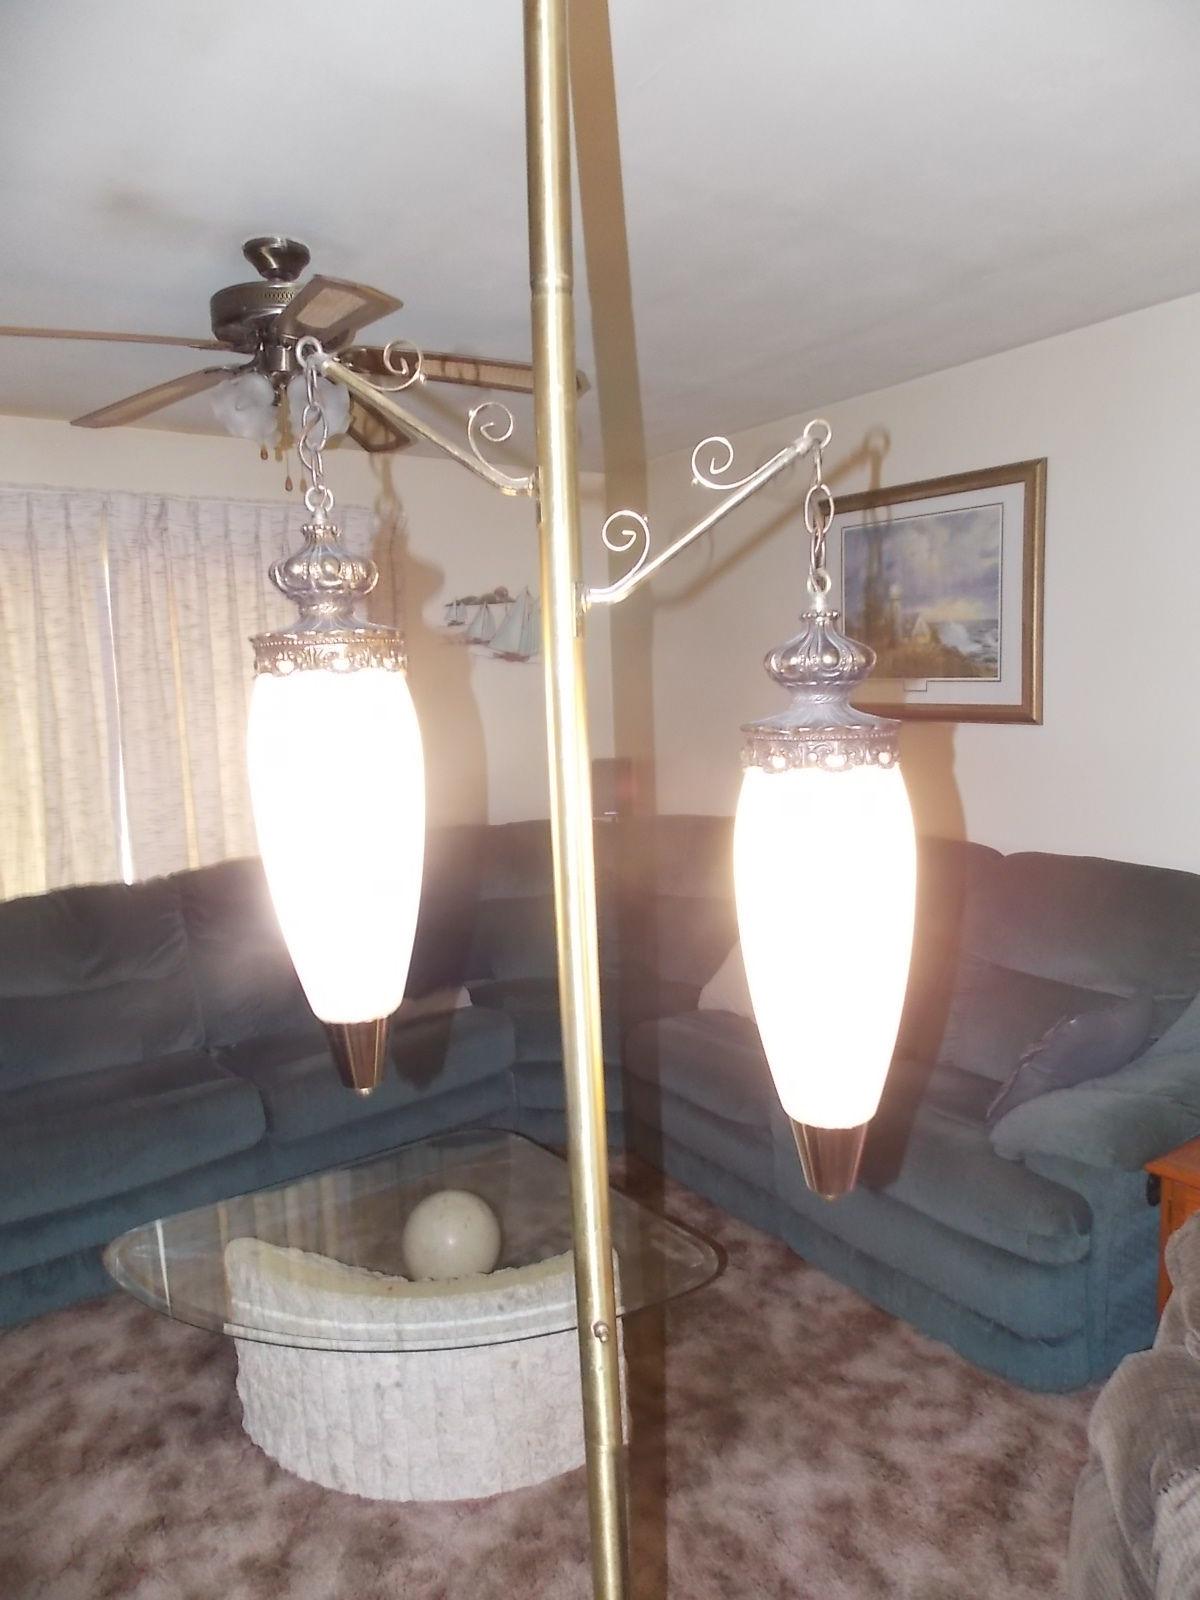 vintage-tension-pole-lamp-photo-13